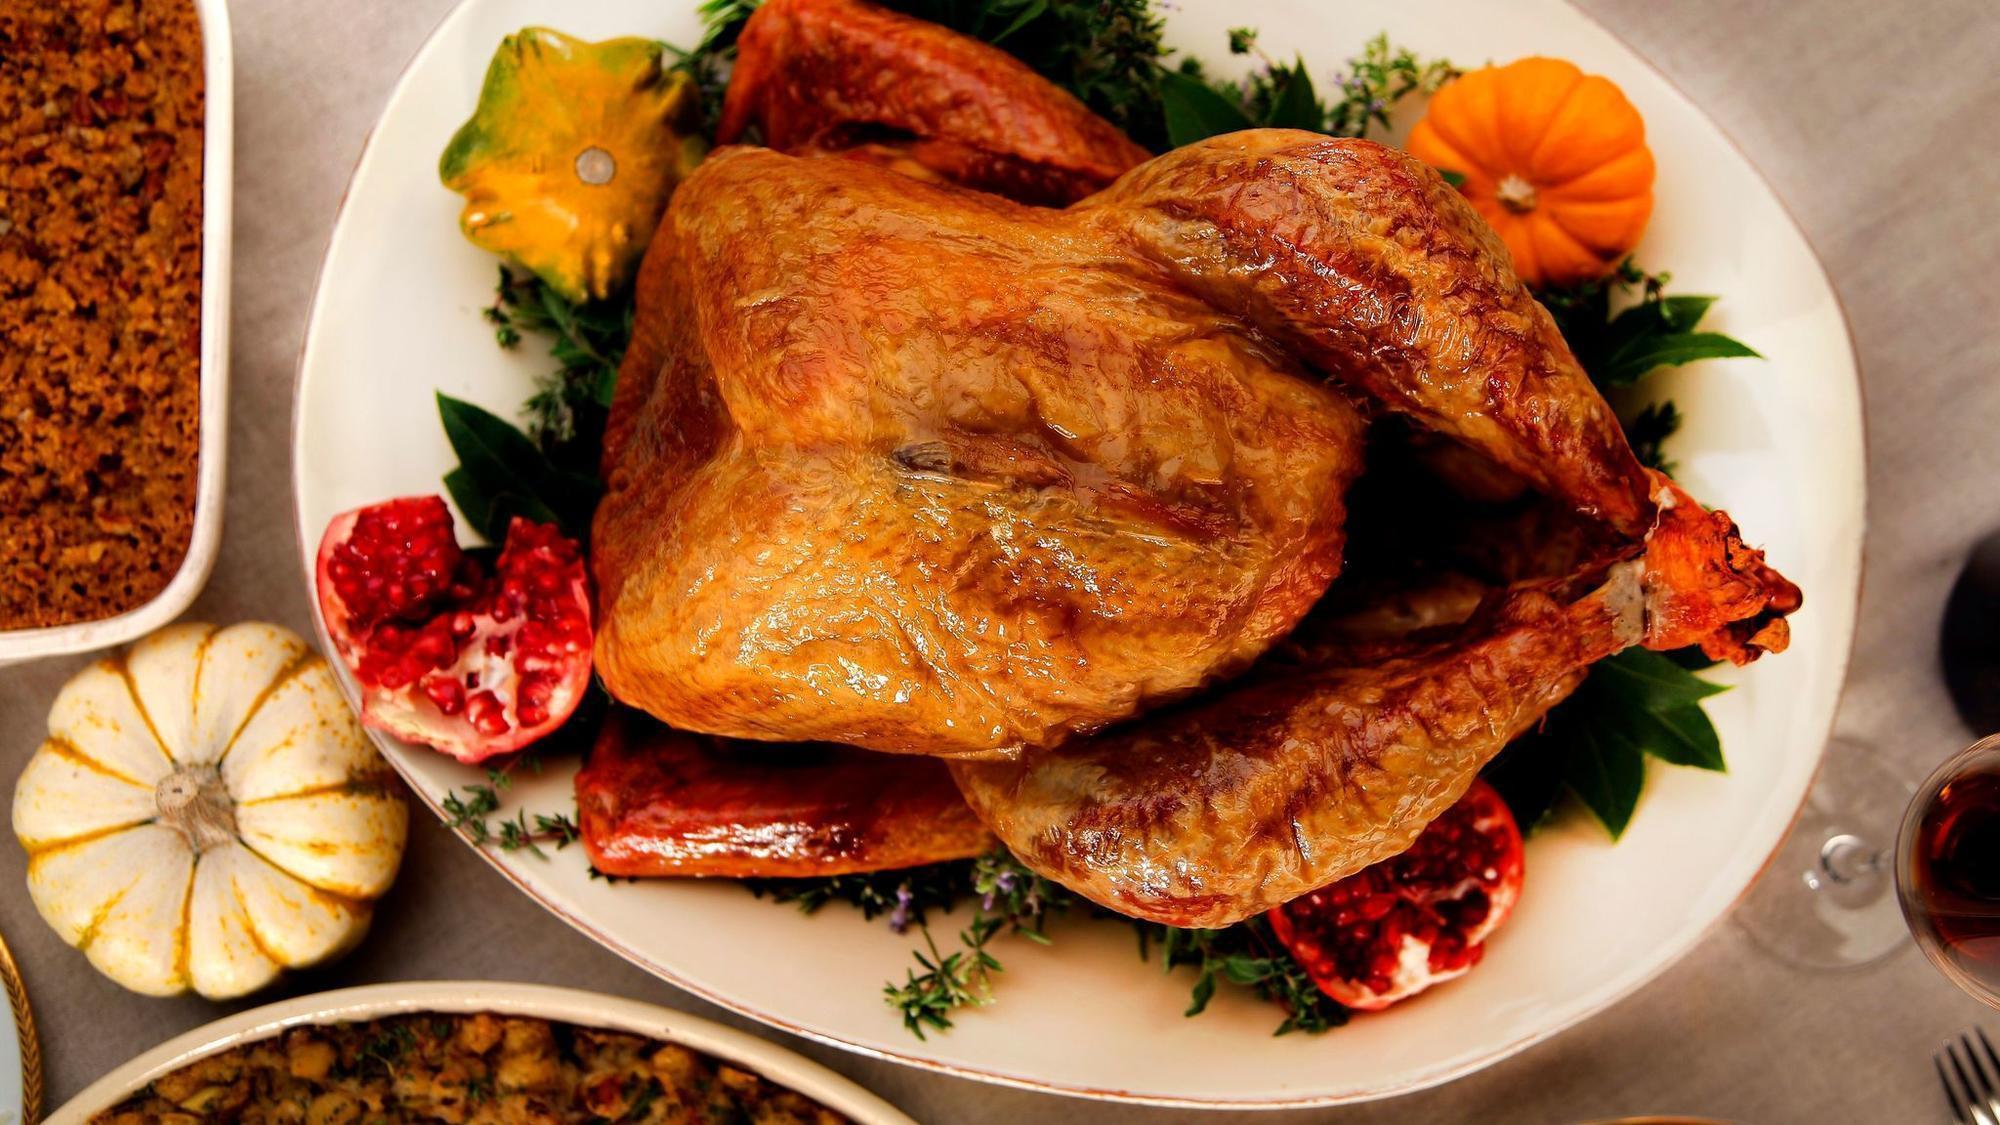 Prepare Thanksgiving Turkey  Turkey 101 How to cook a Thanksgiving turkey LA Times